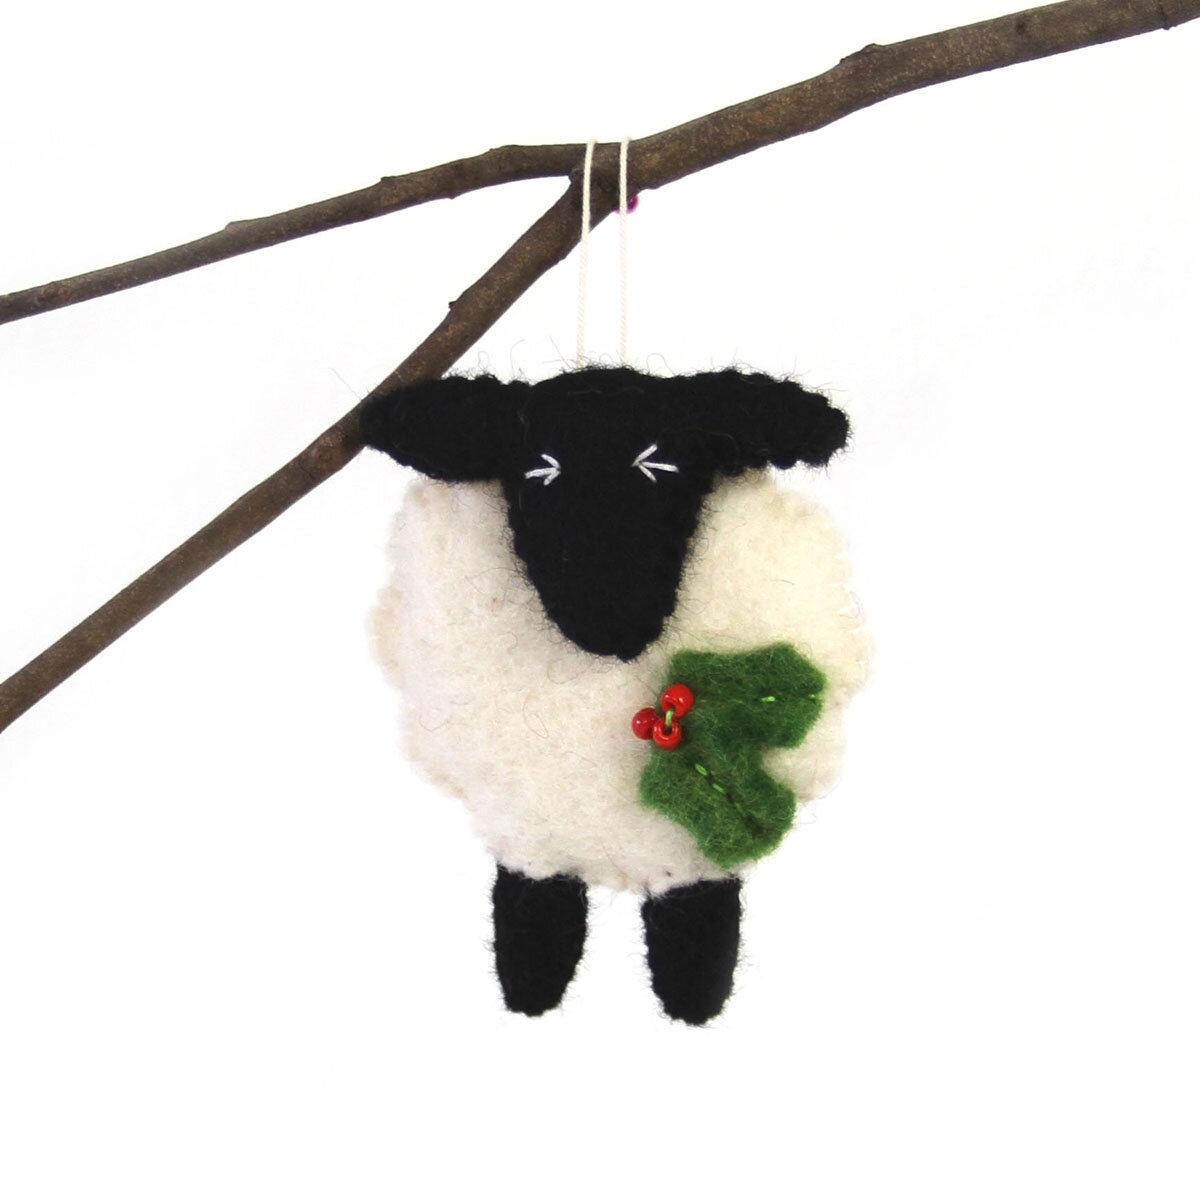 The Holiday Aisle Sheep Hanging Figurine Ornament Wayfair